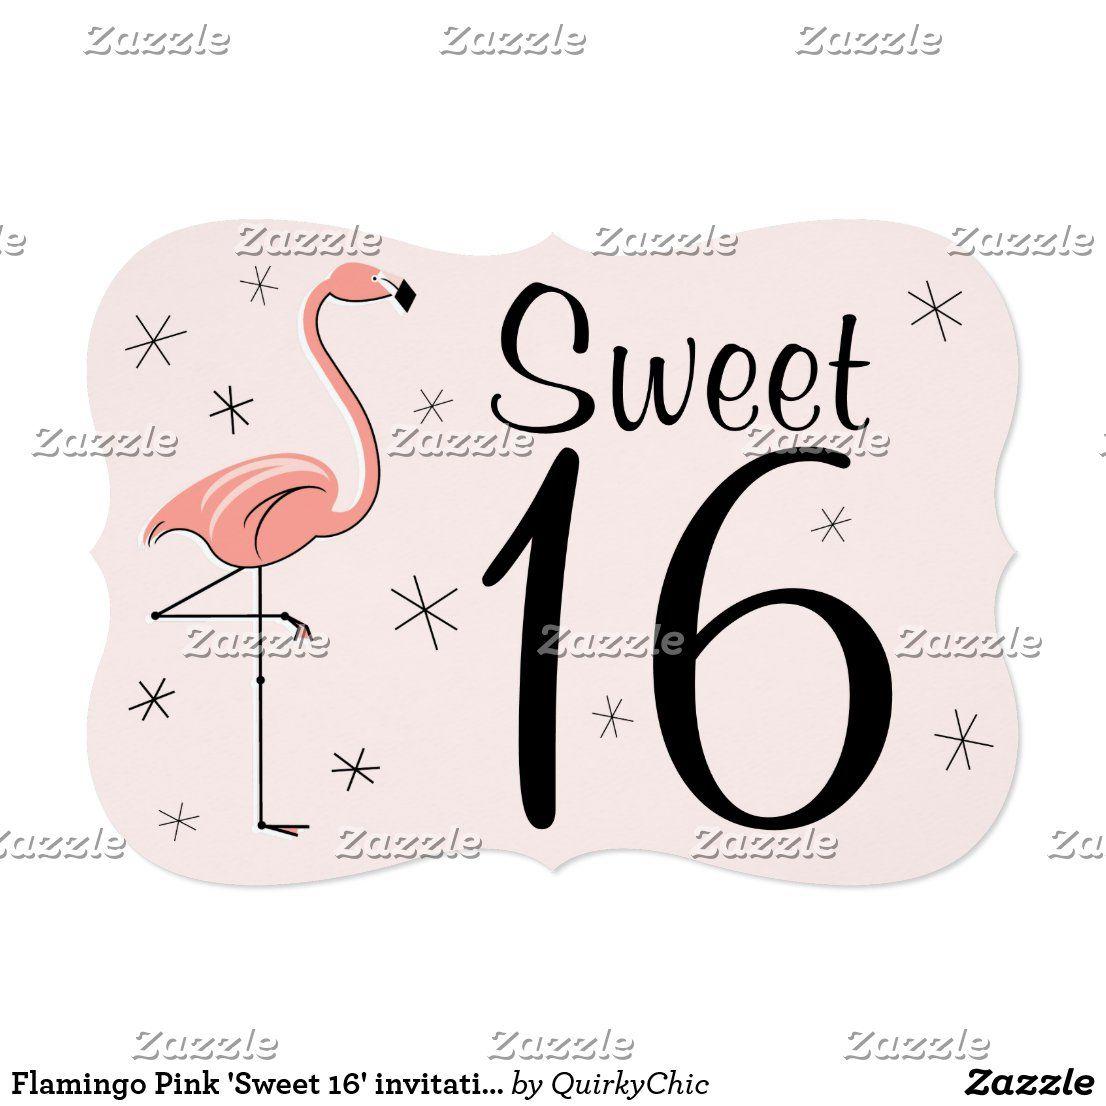 Flamingo Pink 'Sweet 16' invitation bracket